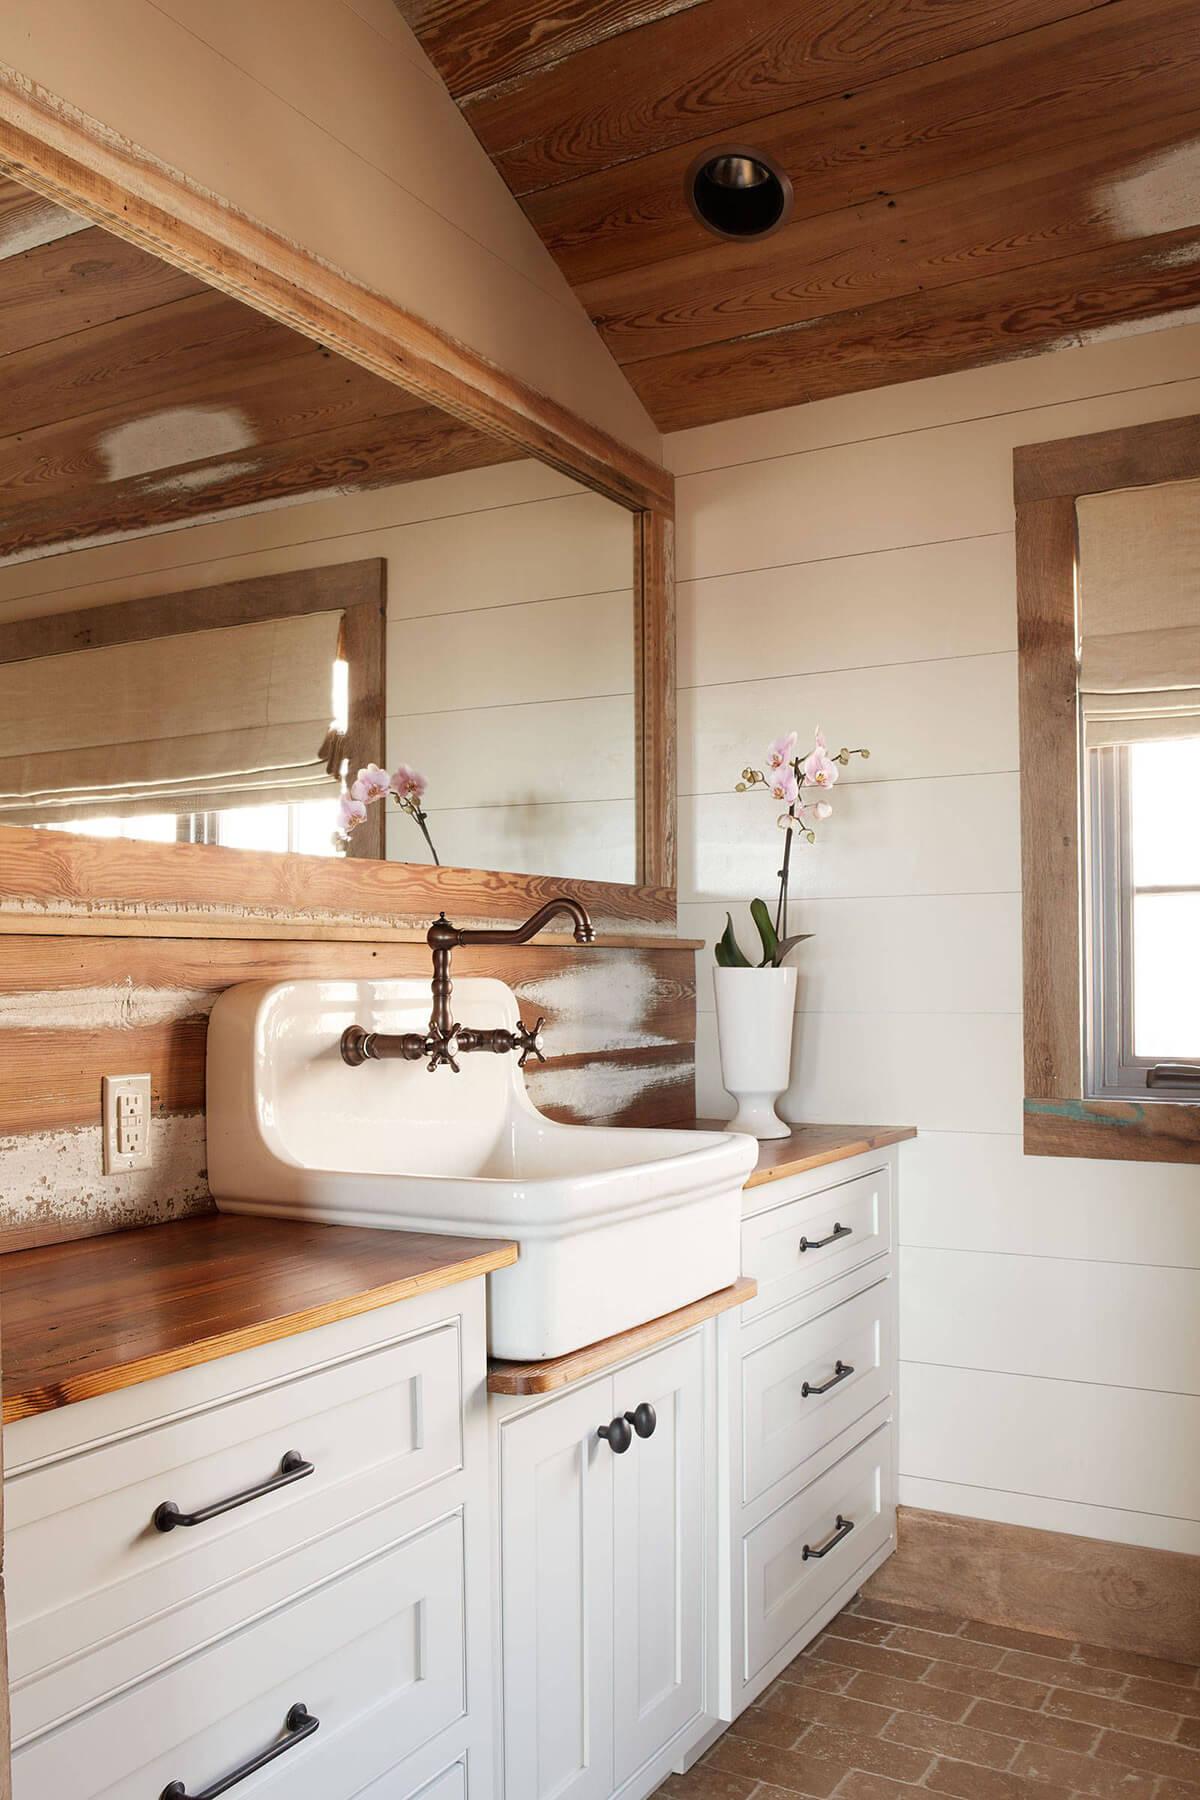 Rustic Wood Backsplash with Unique Sink Basin